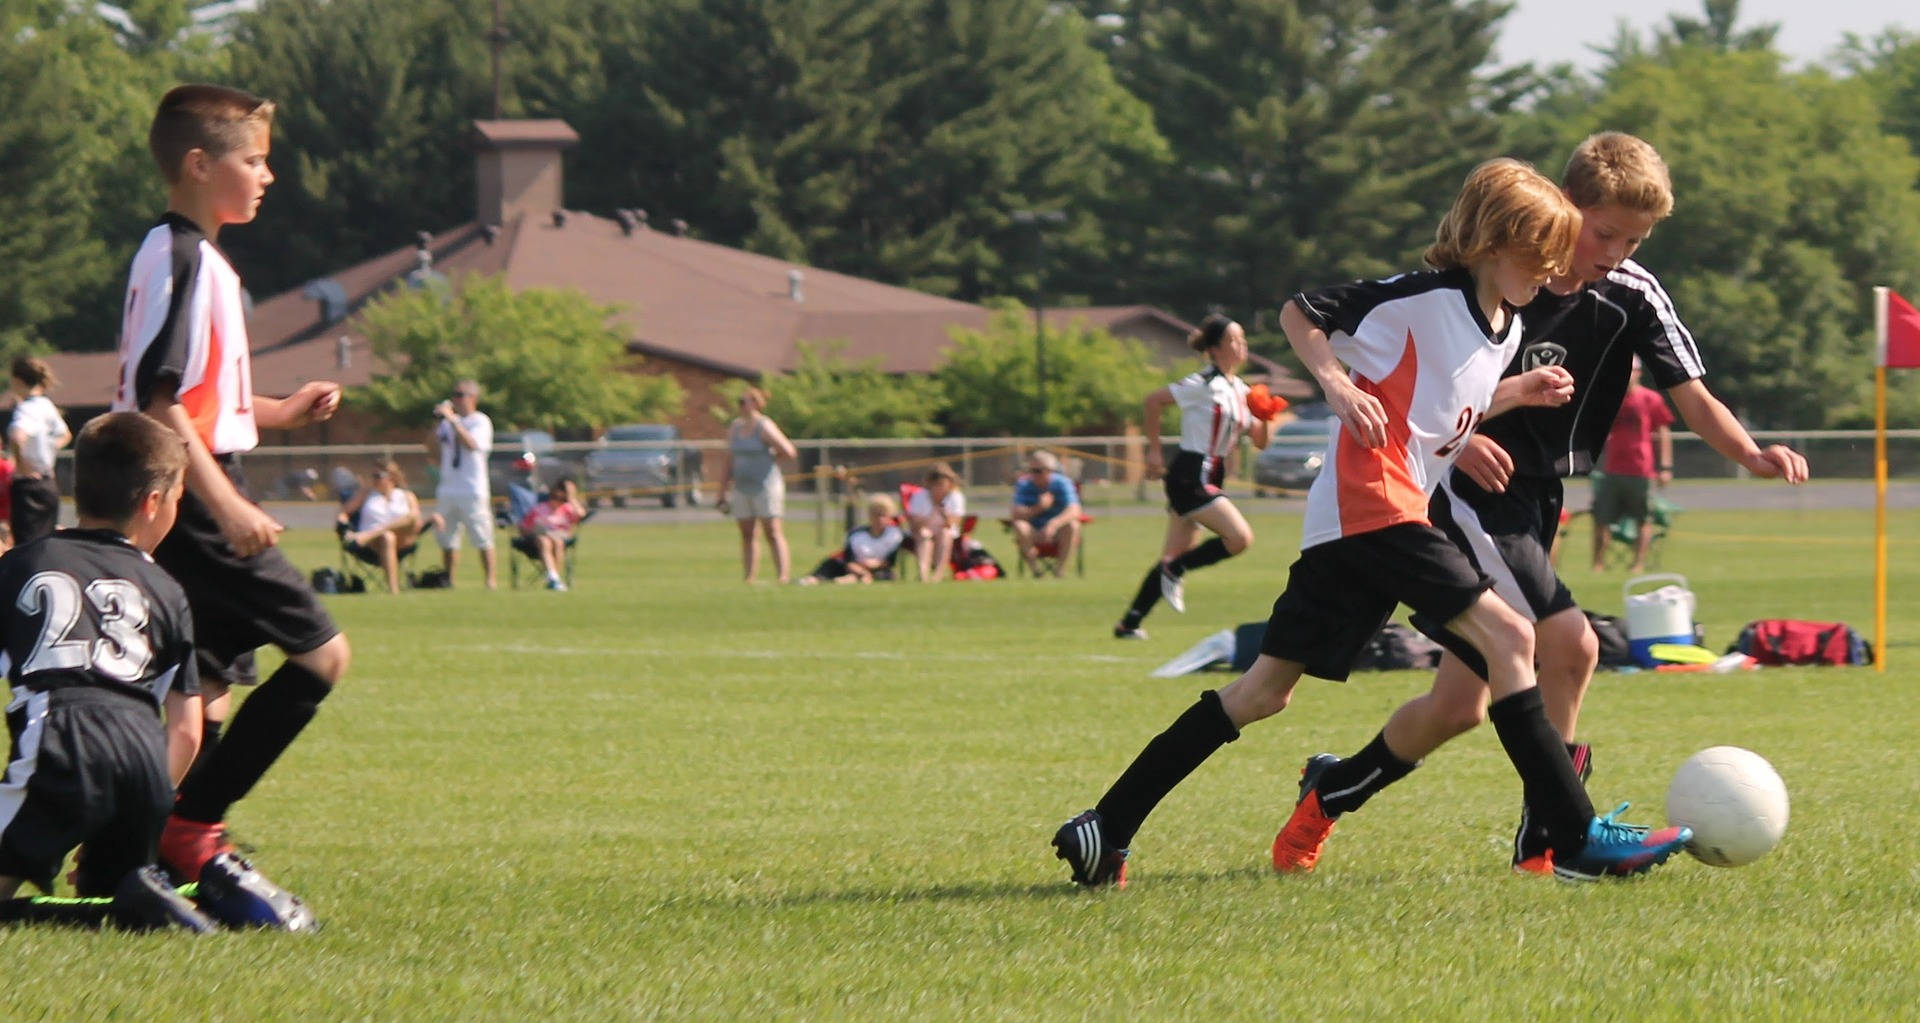 Youth Soccer (Pixabay-JoshDick75)